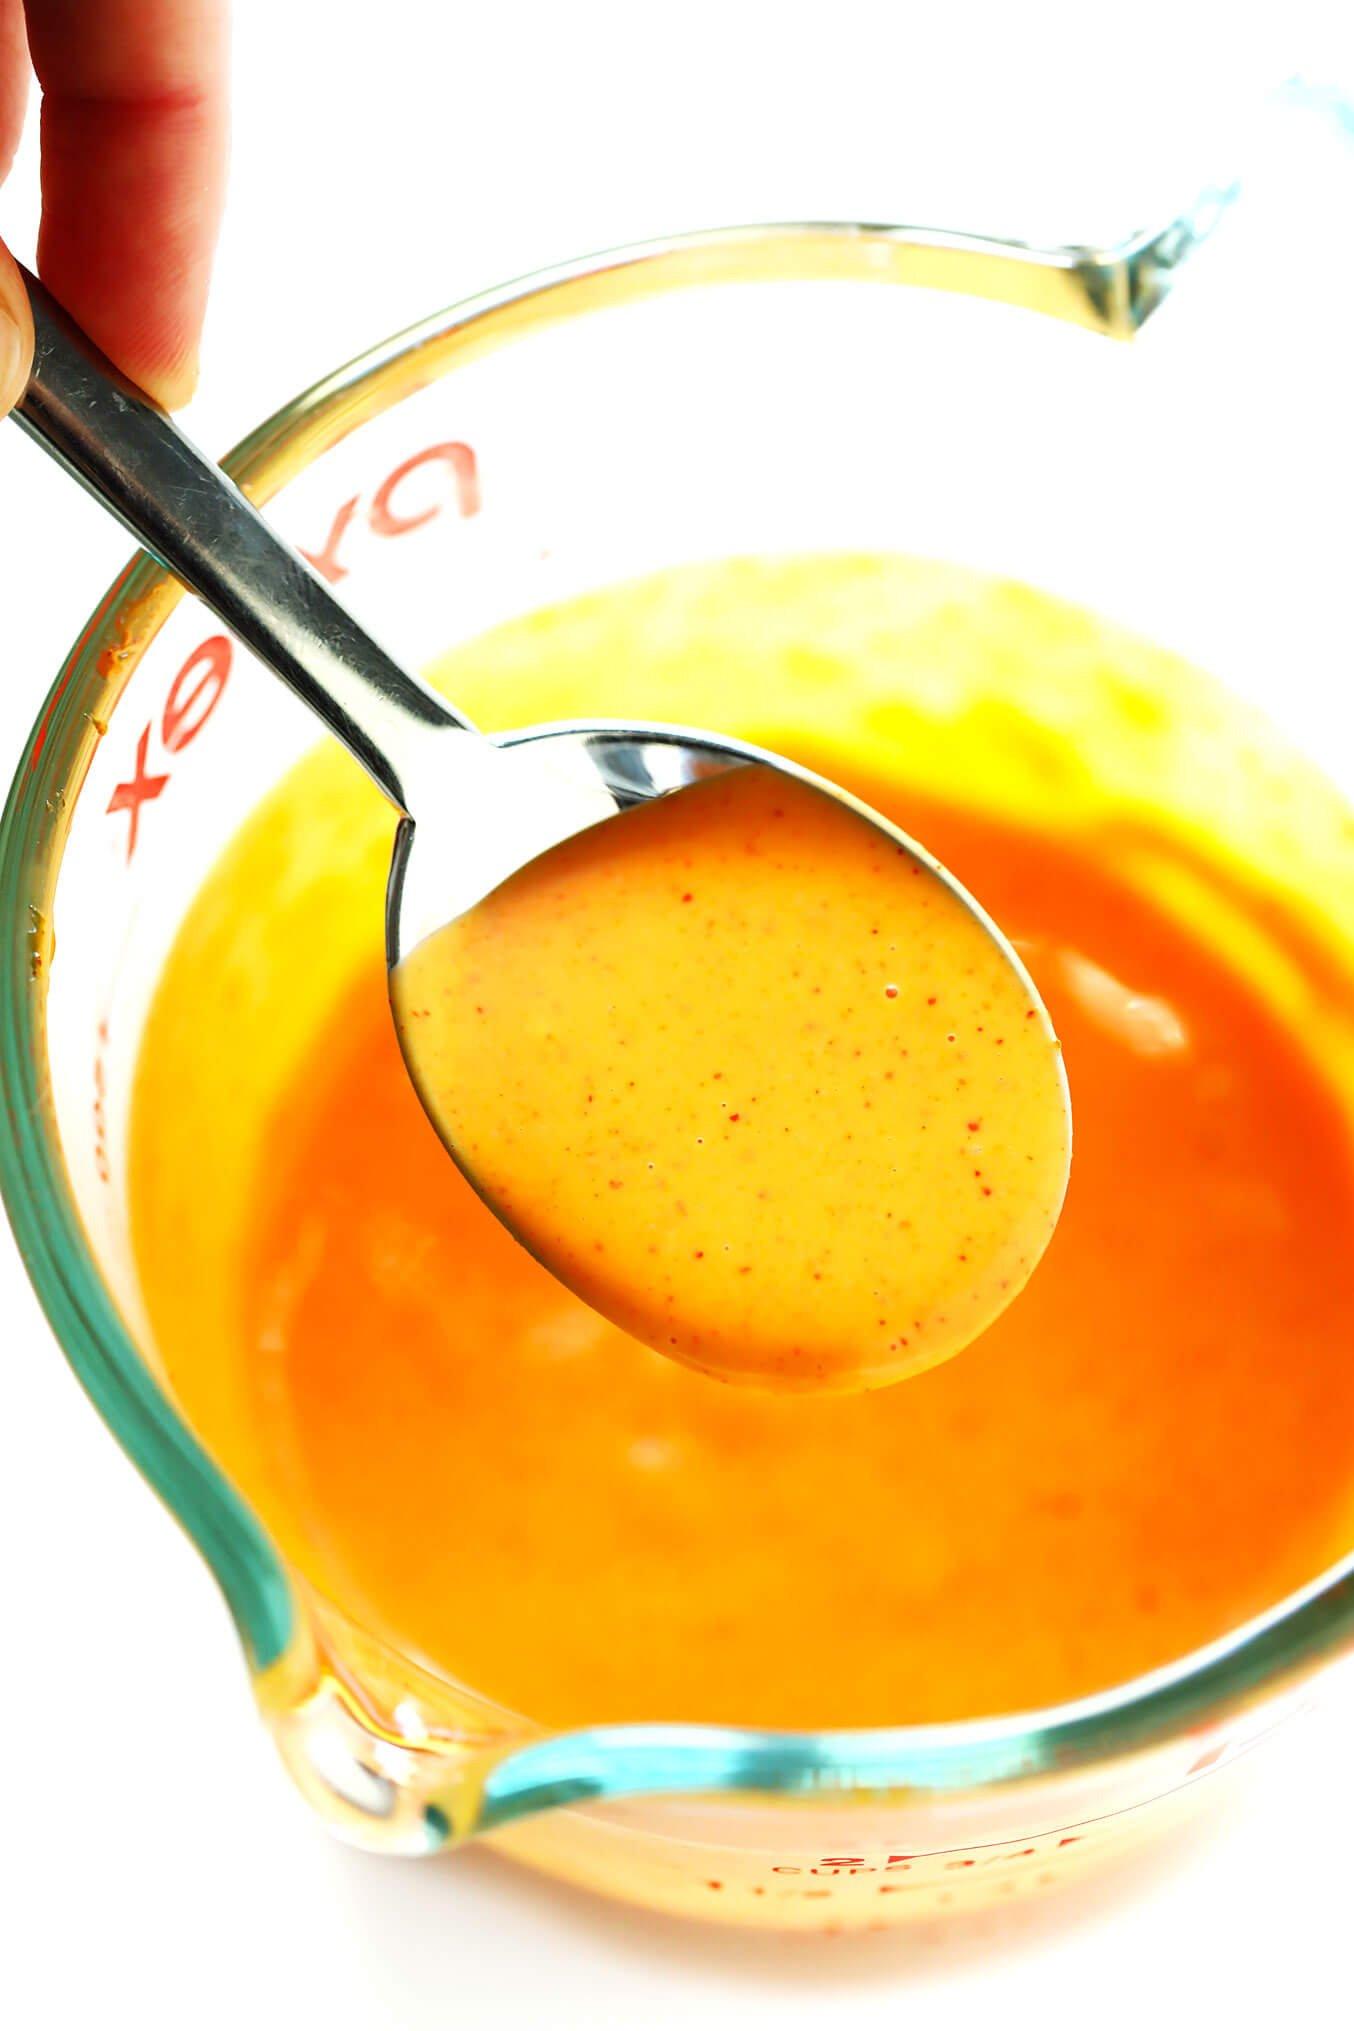 2-Ingredient Korean Creamy Gochujang Sauce